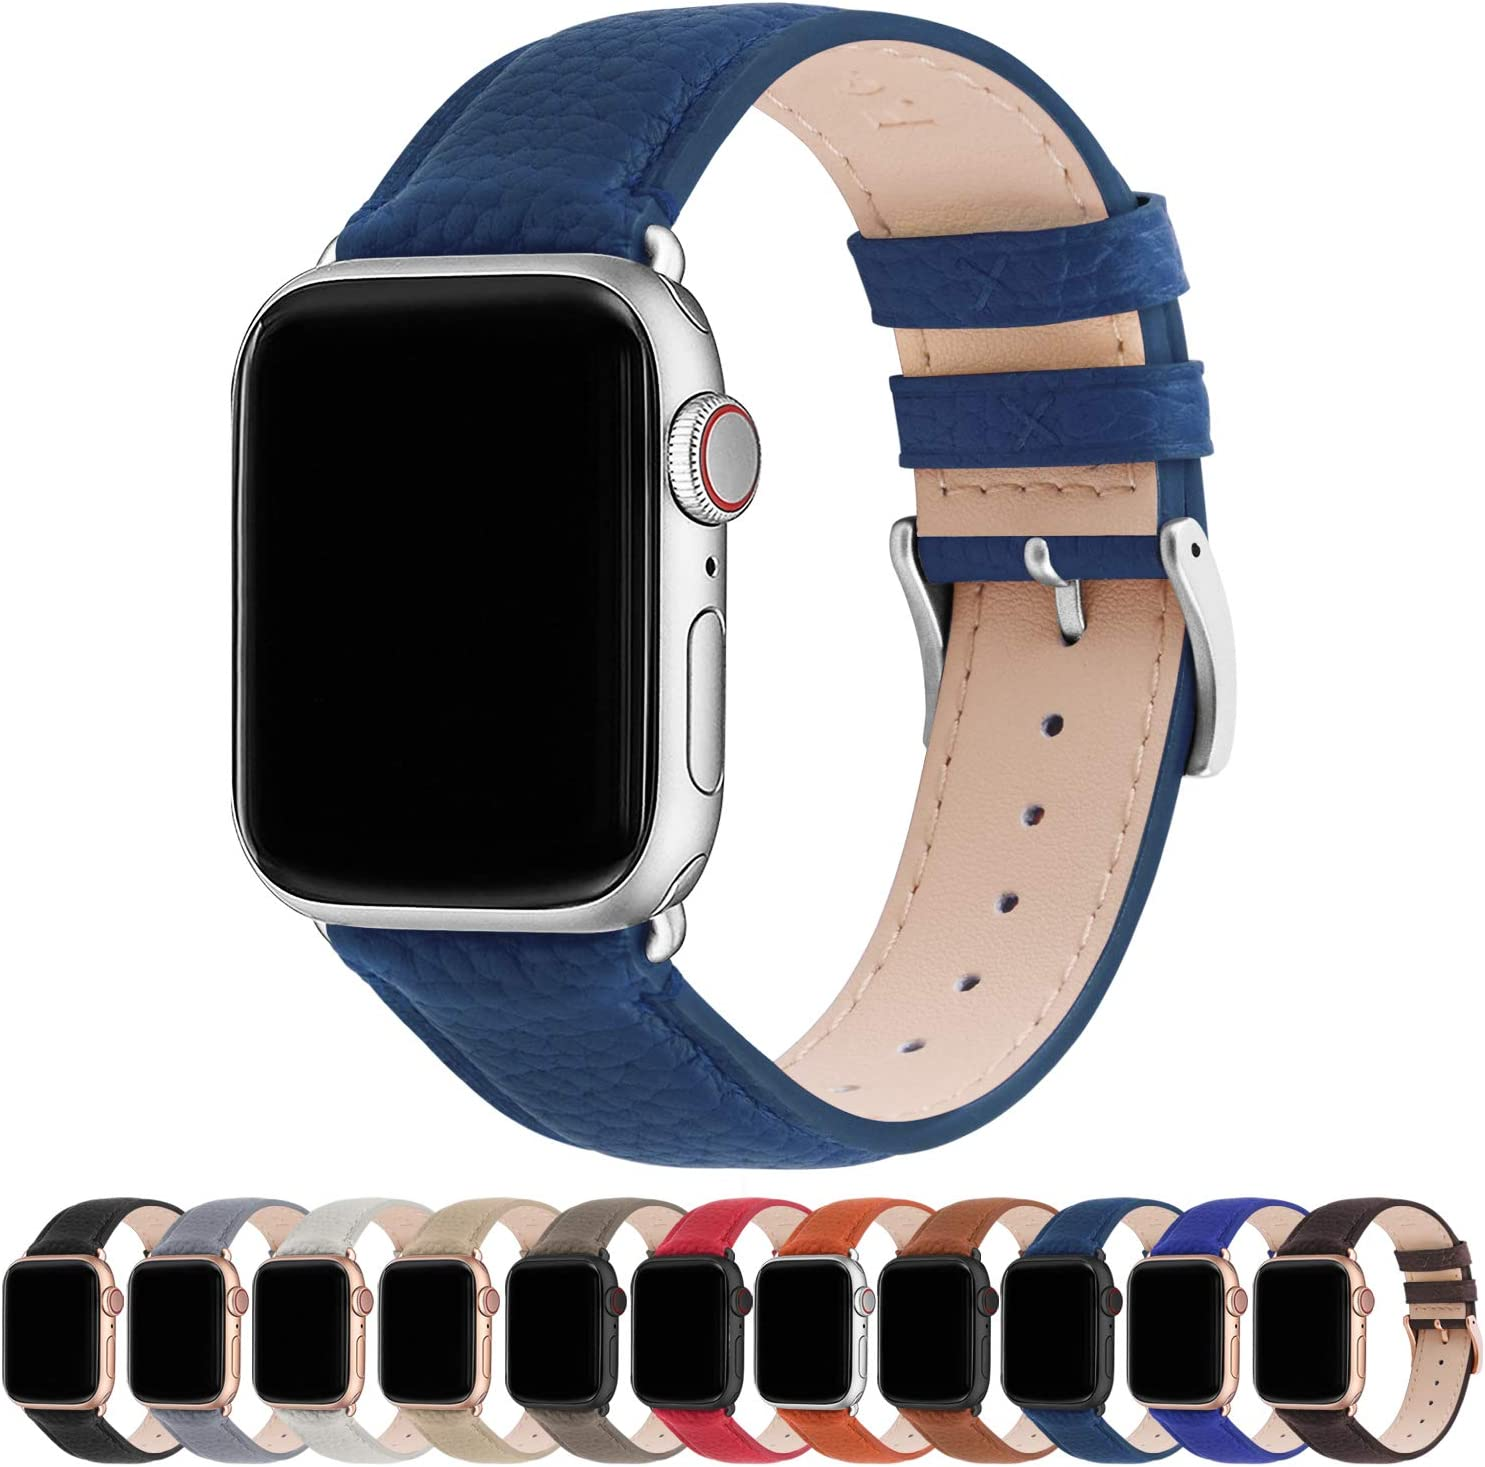 Fullmosa Compatible Apple Watch Band 44mm 42mm 40mm 38mm Leather Compatible iWatch Band/Strap Compatible Apple Watch SE & Series 6 5 4 3 2 1, 38mm 40mm, Dark Blue + Silver Buckle